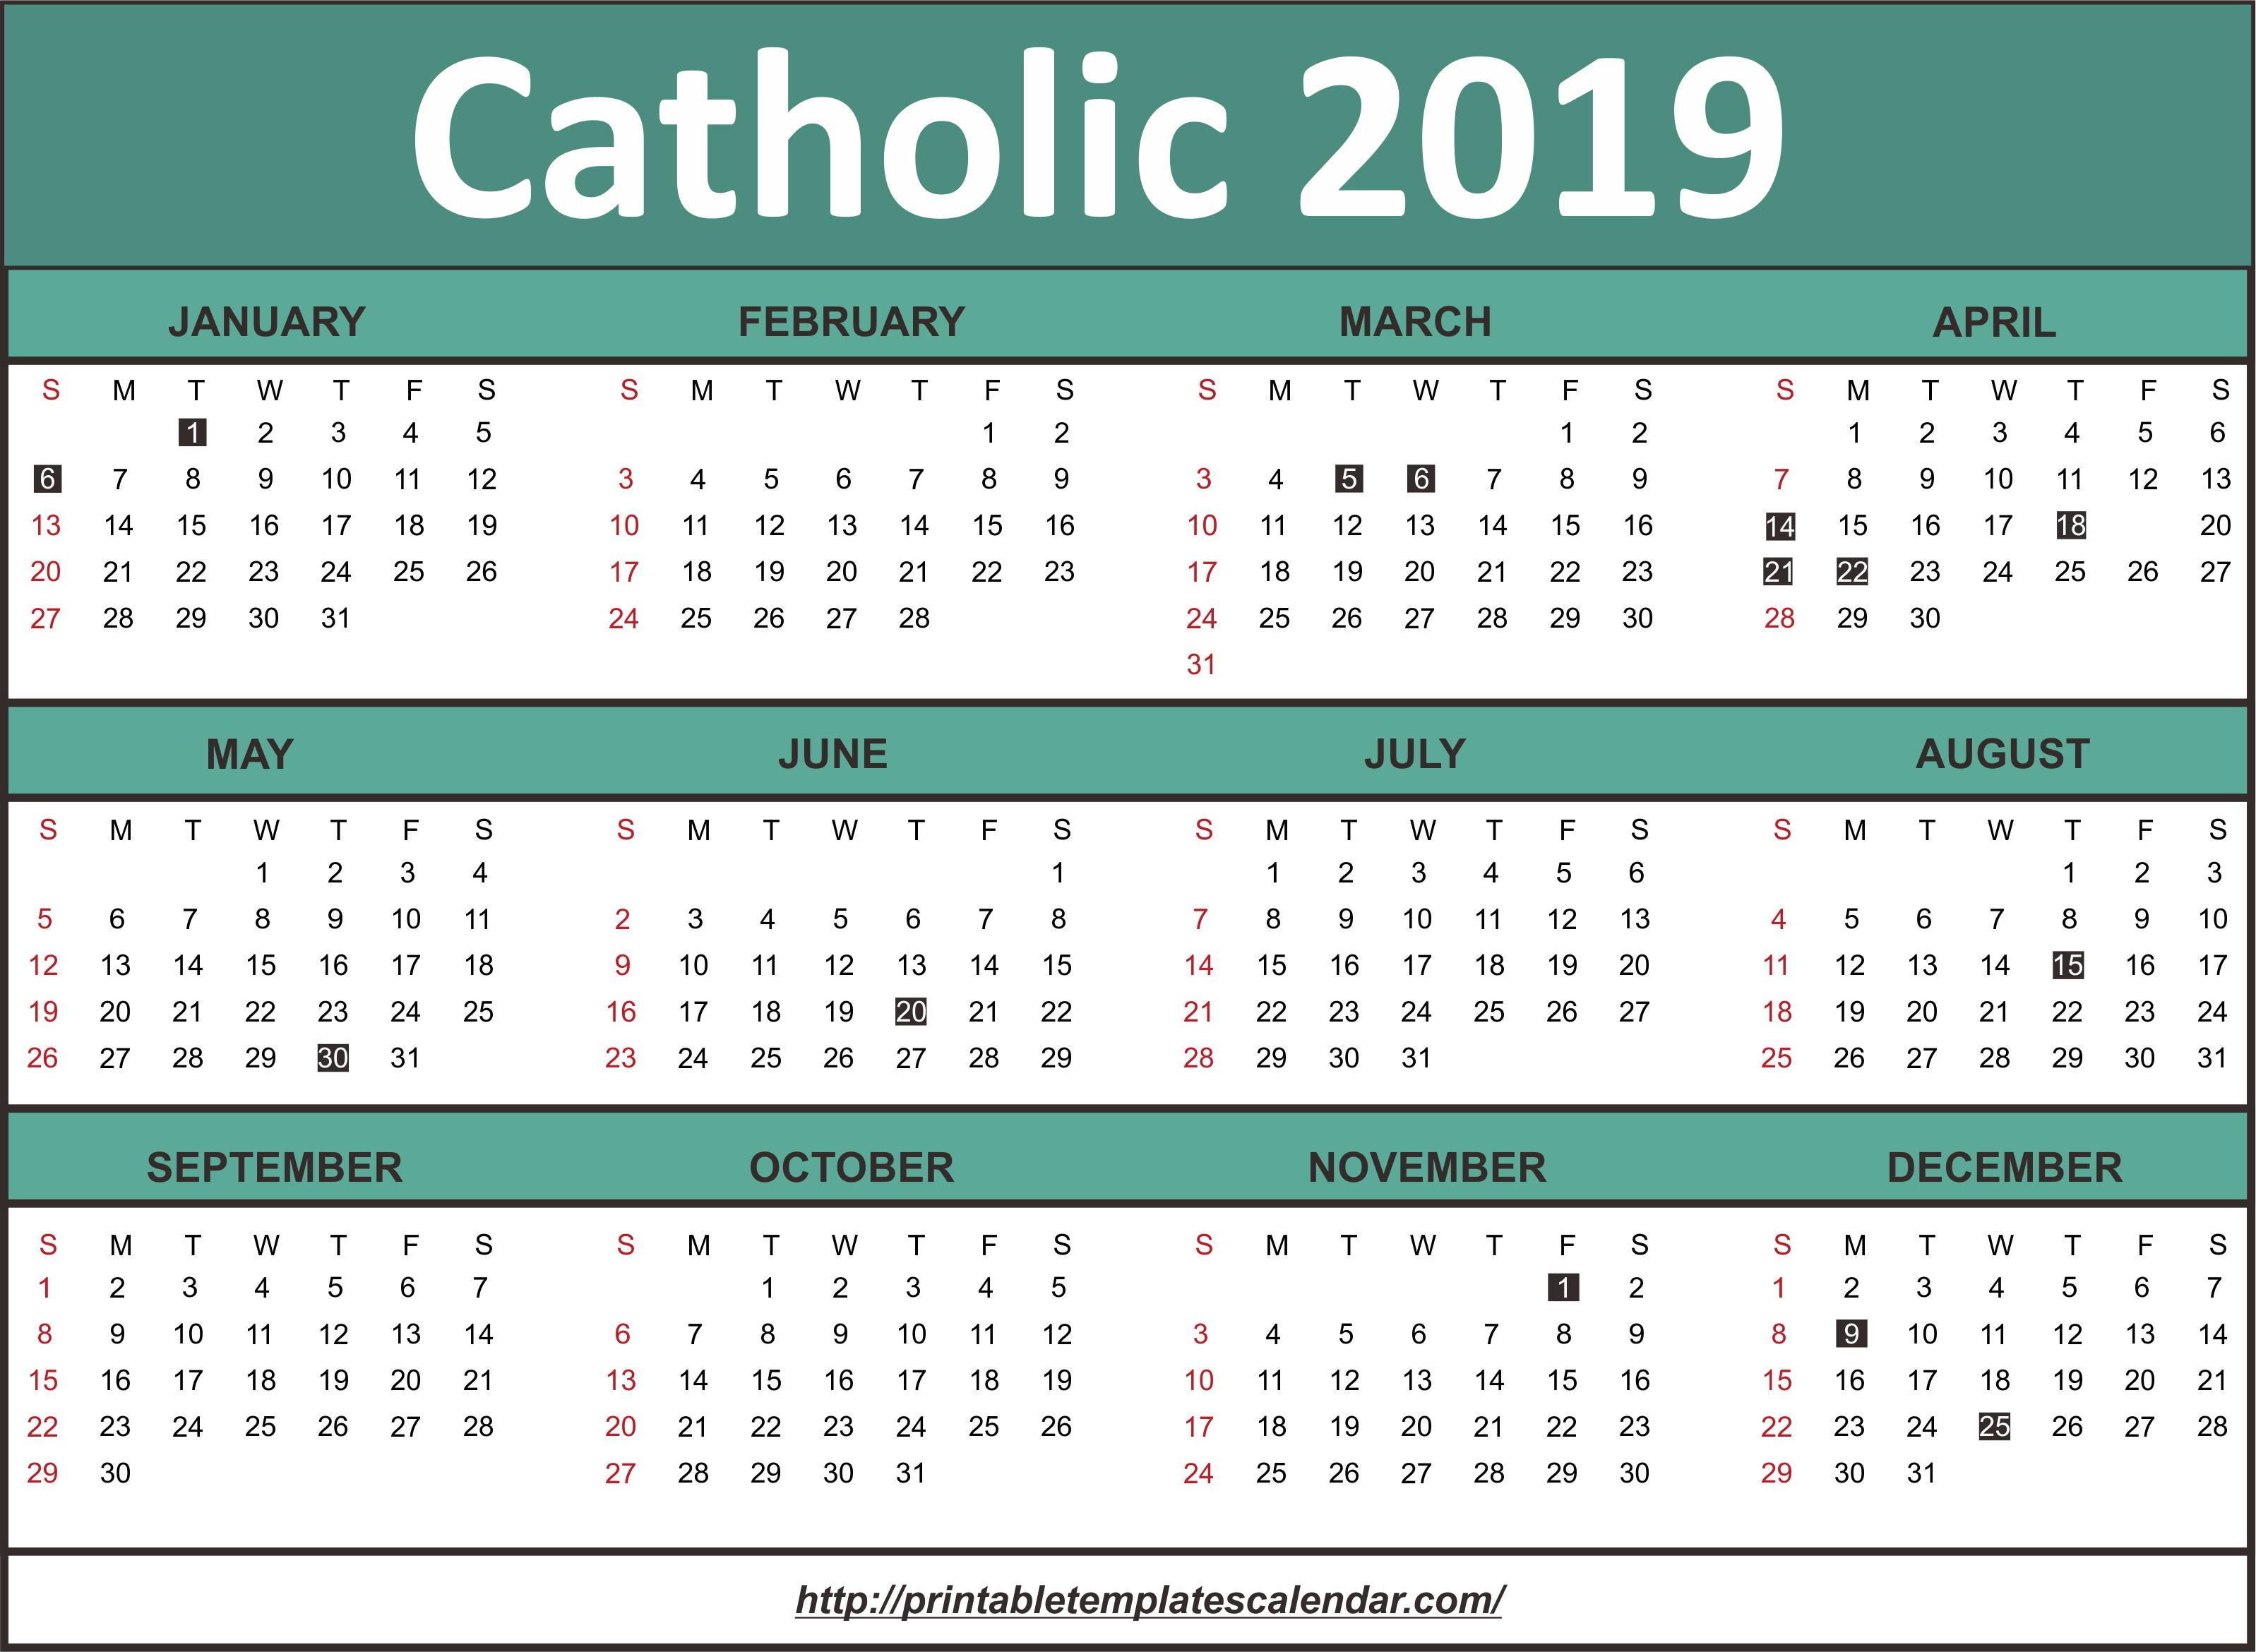 Roman Catholic Calendar 2019 | Calendar 2019 Calendar 2019 Roman